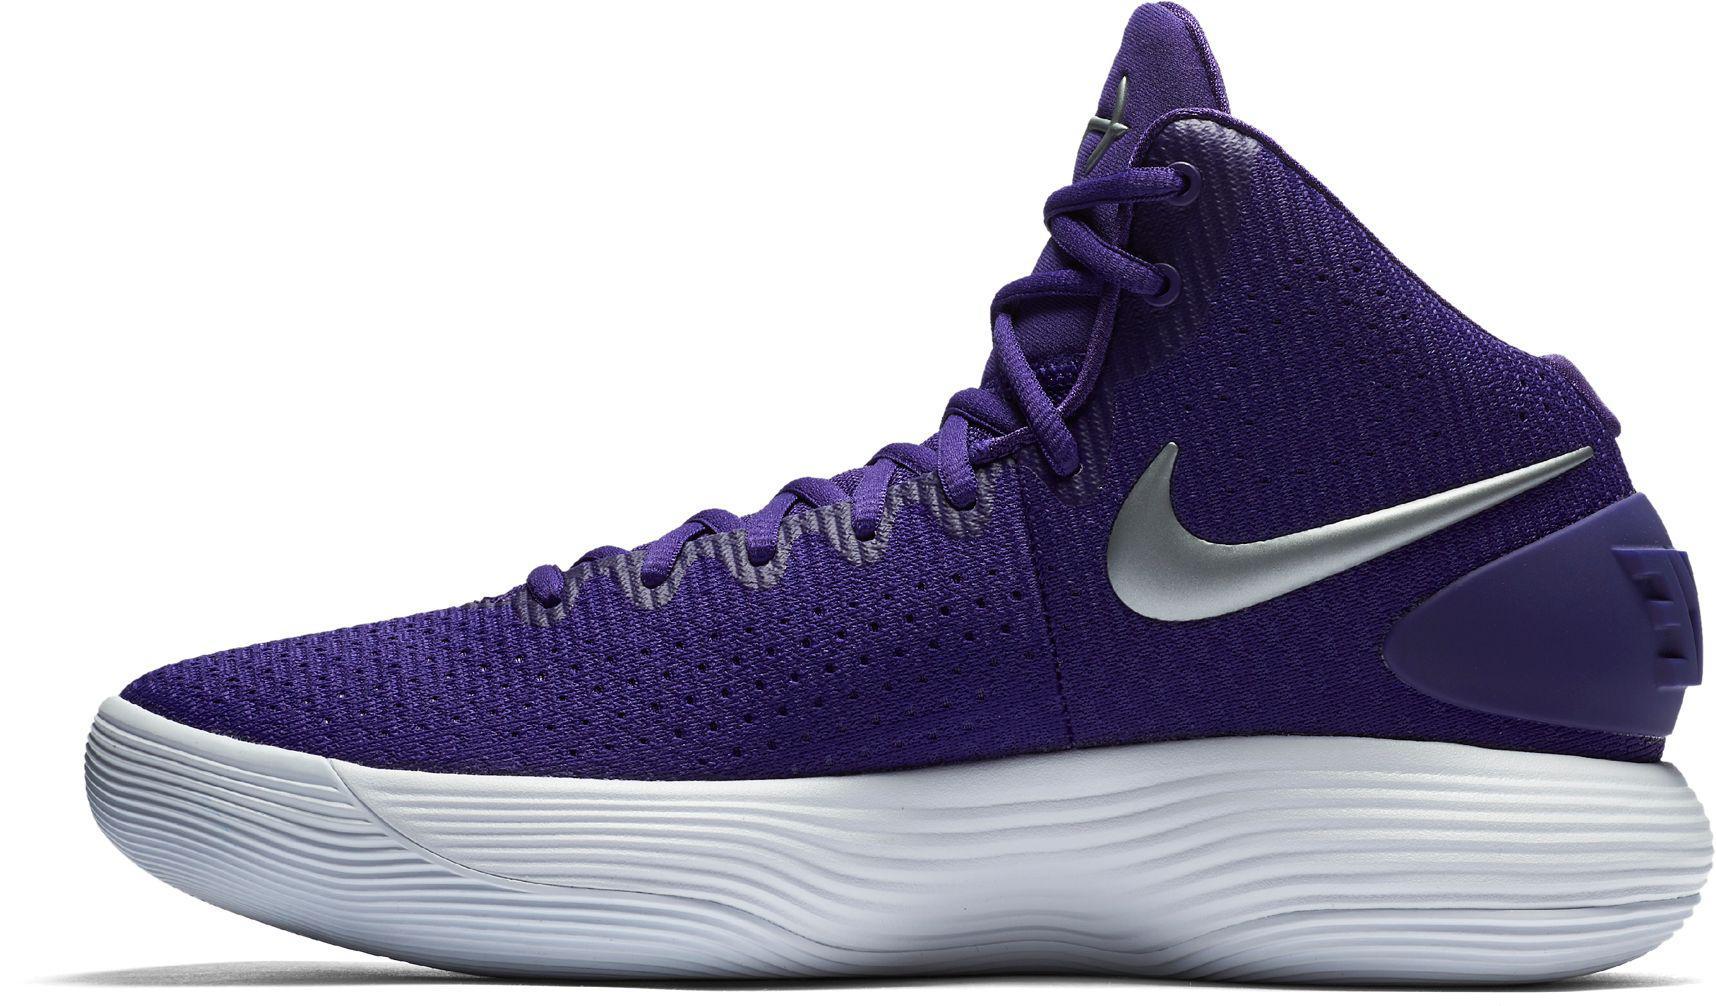 2aa5c5647bfa Nike React Hyperdunk 2017 Basketball Shoes in Purple for Men - Lyst